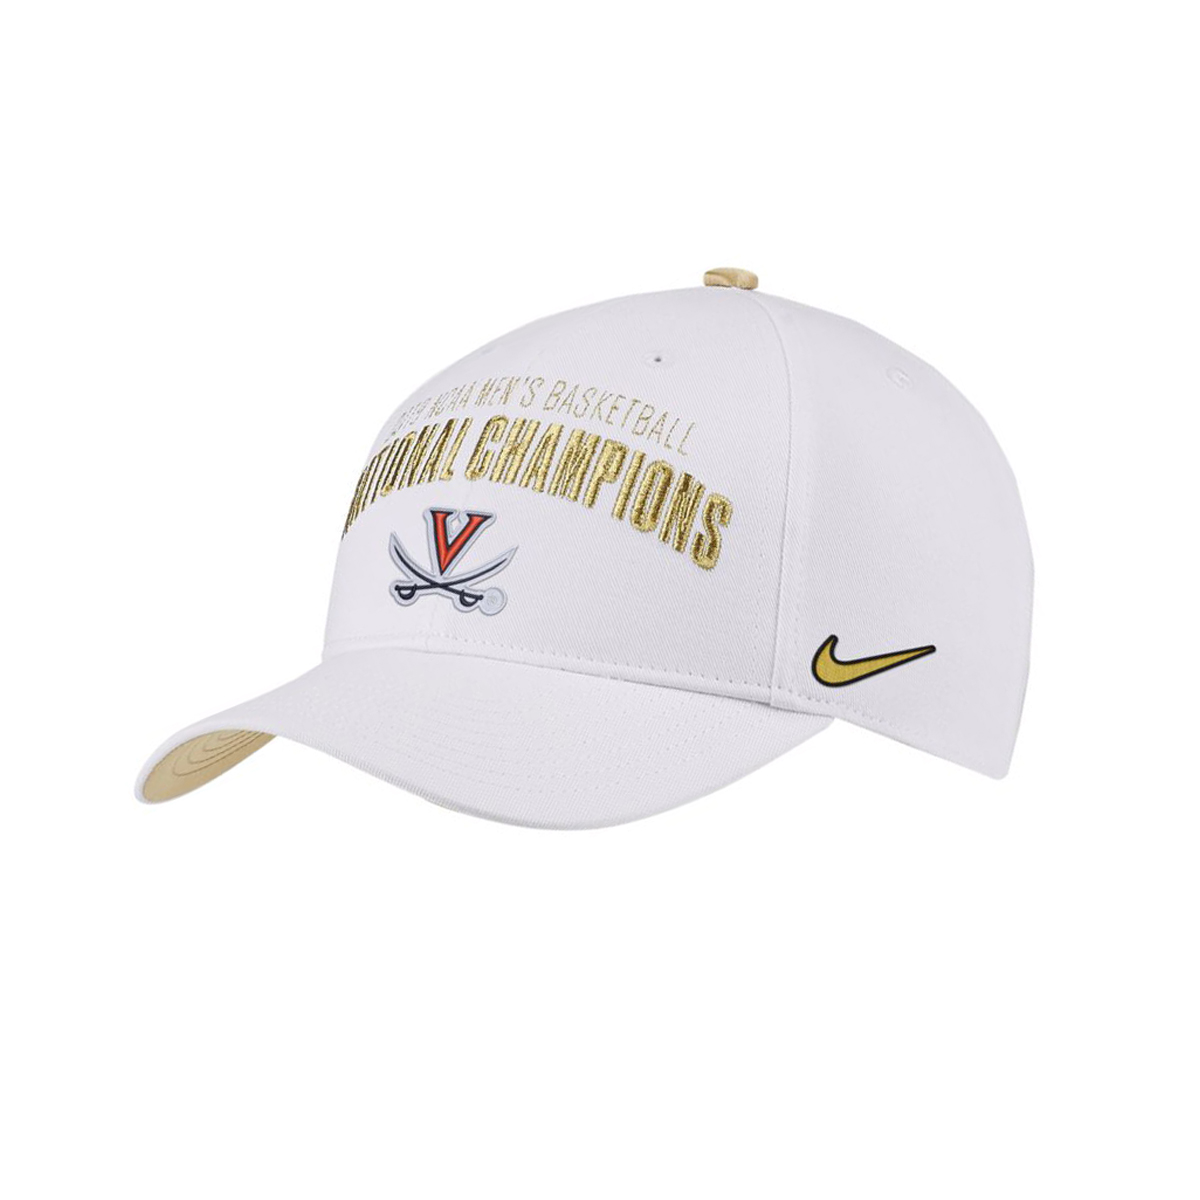 2019 National Champions Locker Room Hat